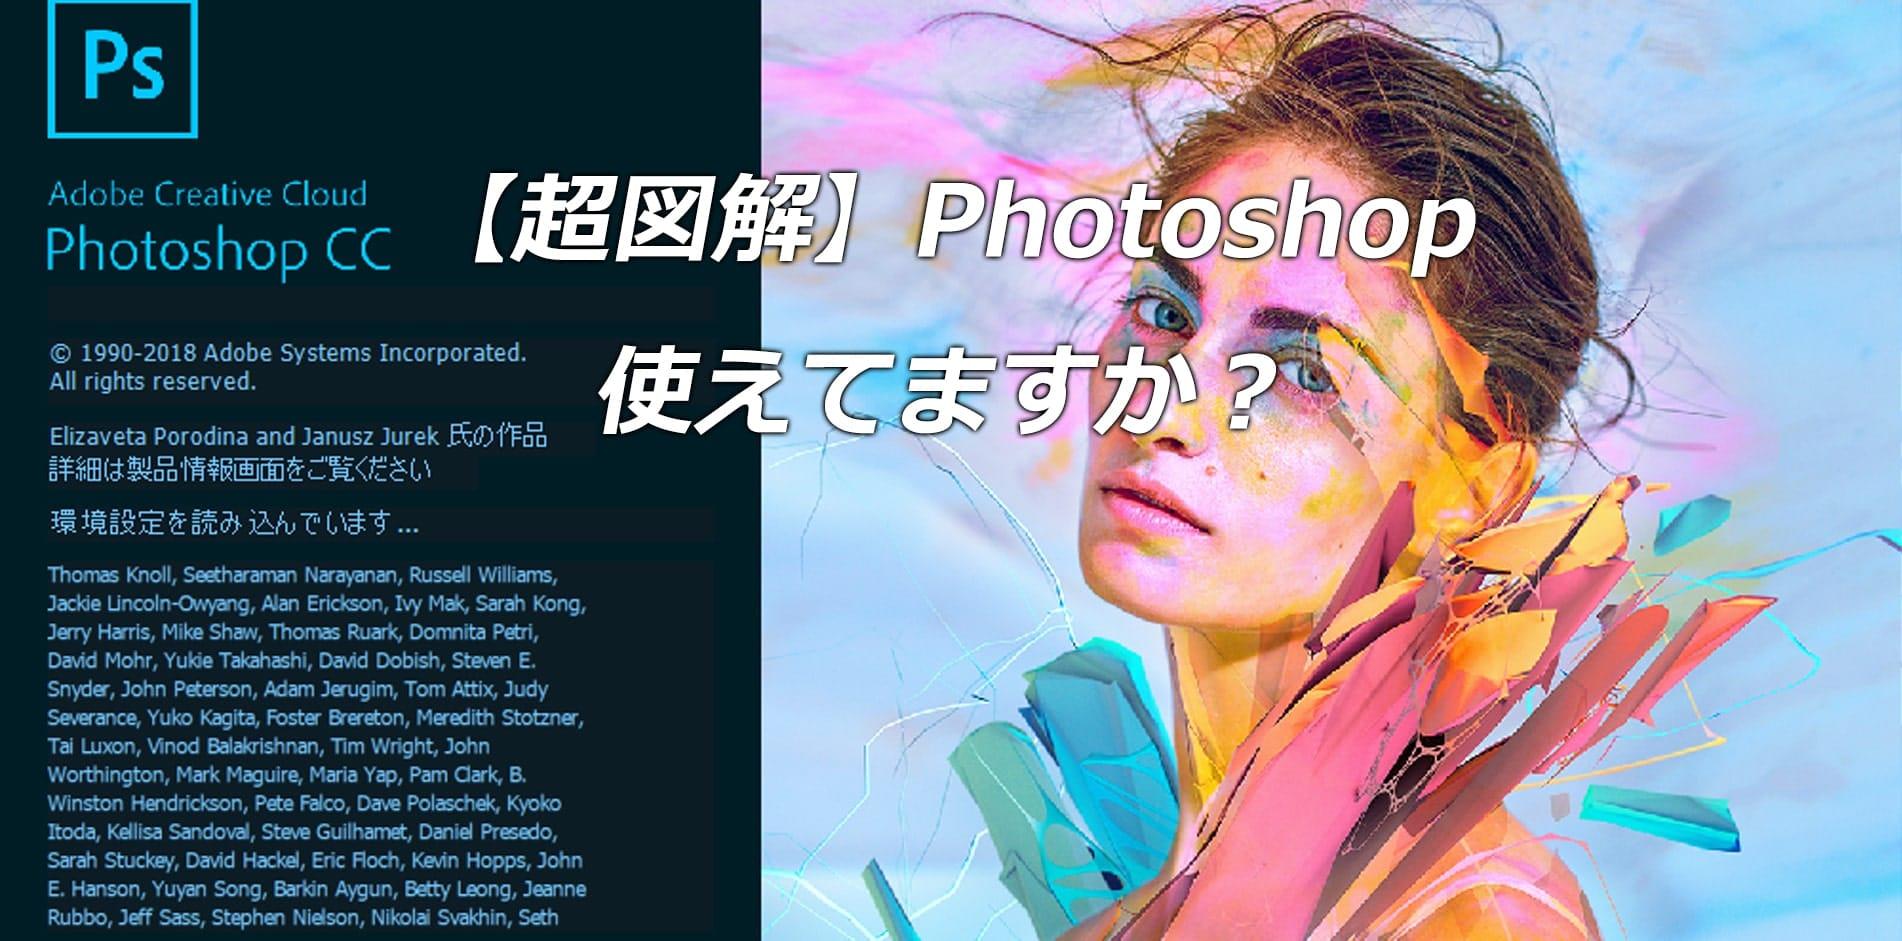 Photoshop 便利に使うテク【特集】